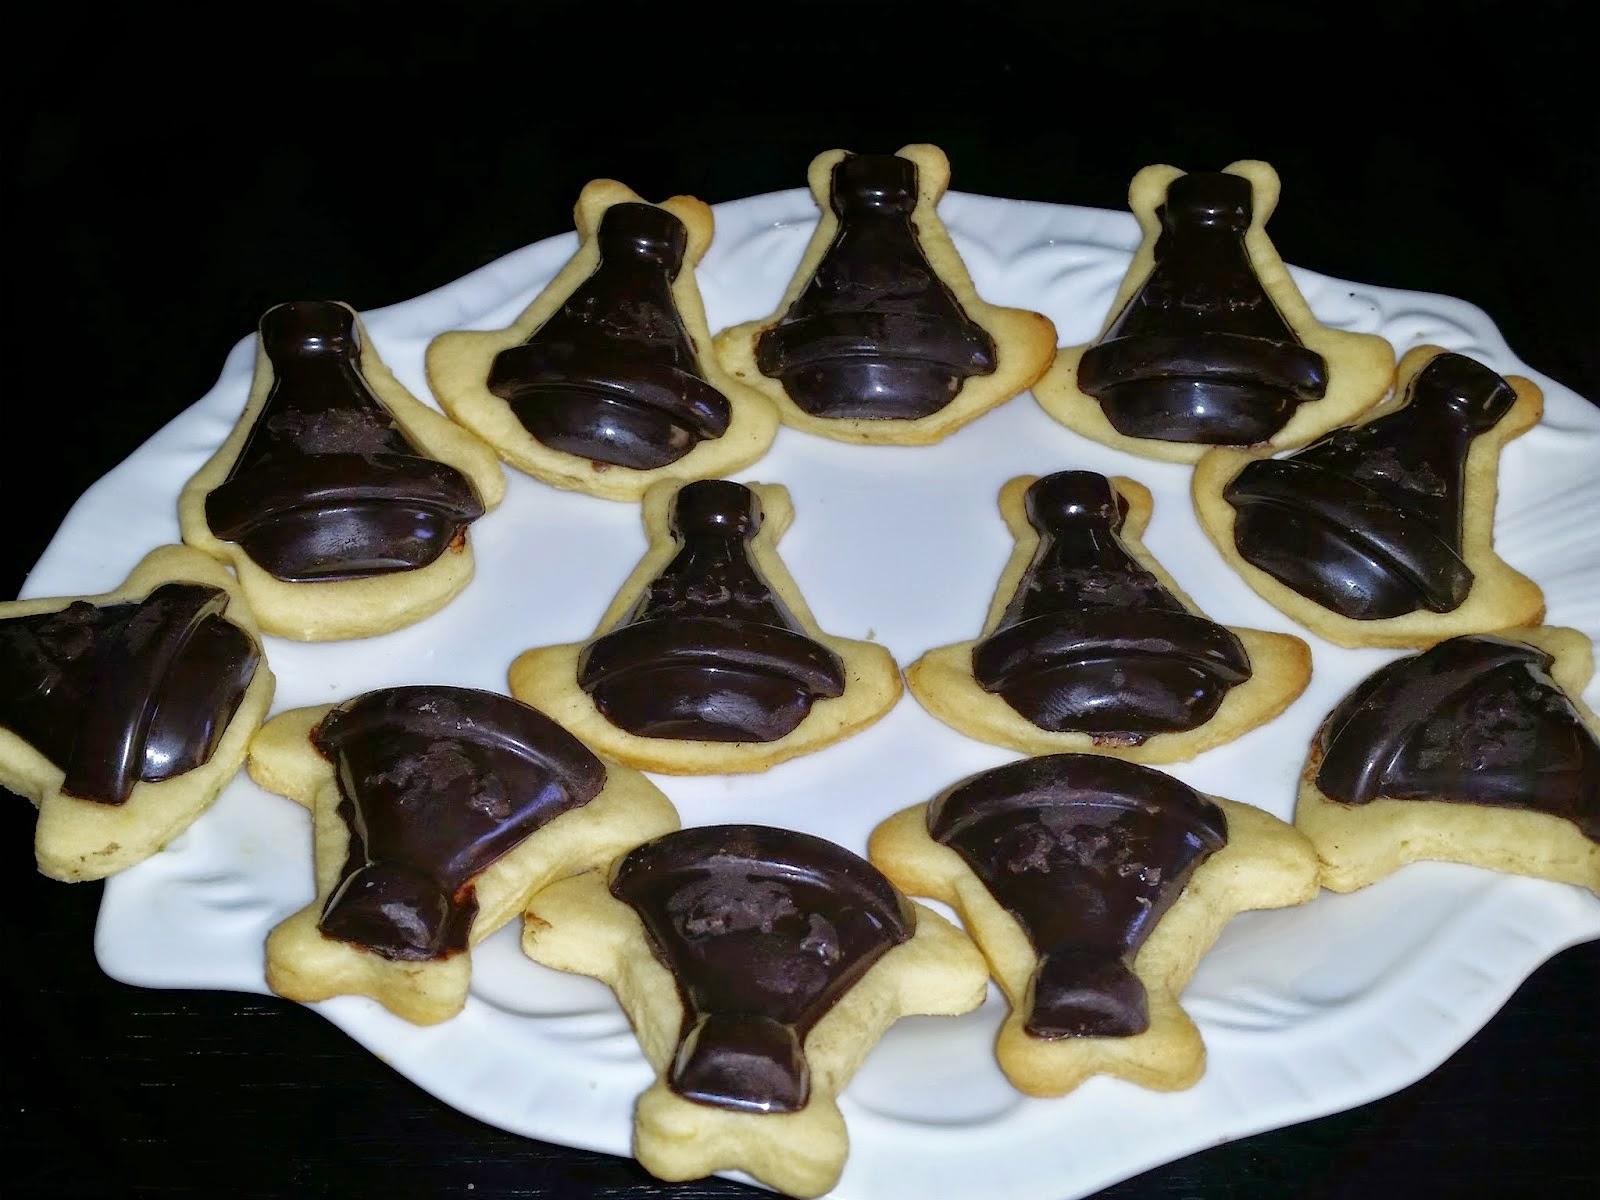 http://www.cuisinepress.com/2015/07/blog-post.html